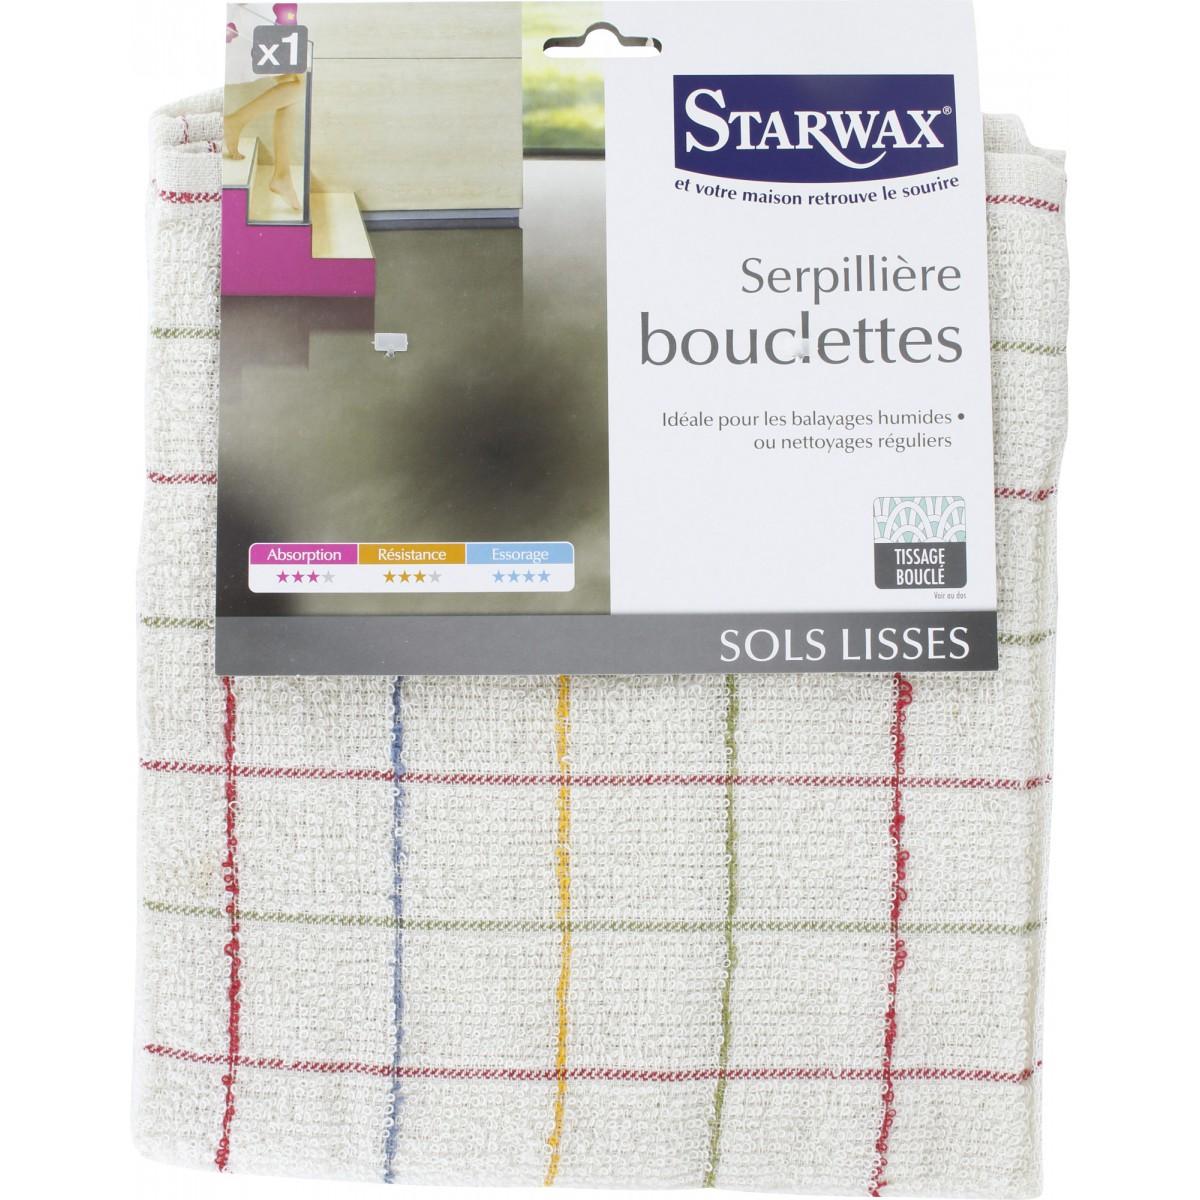 Serpillière bouclettes Starwax